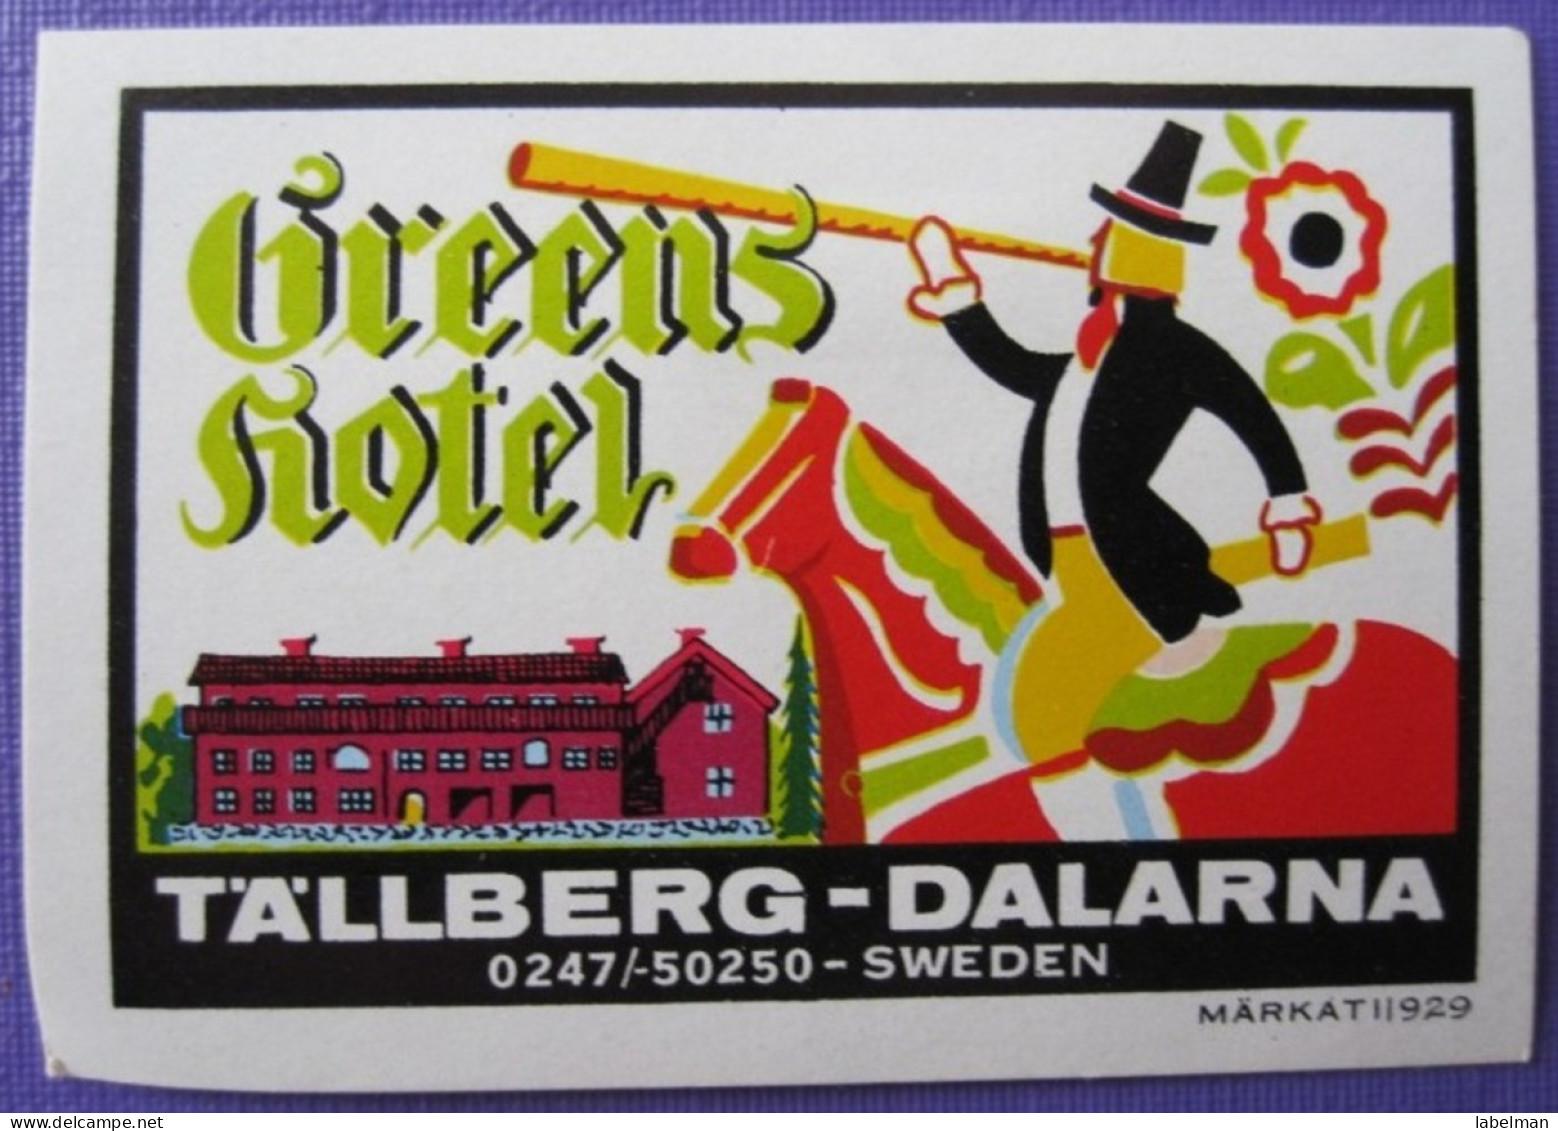 HOTEL HOTELLI HOTELL HOTELLET PENSION GREEN TALLBERG DALARNA MINI SVERIGE SWEDEN DECAL LUGGAGE LABEL ETIQUETTE AUFKLEBER - Hotel Labels